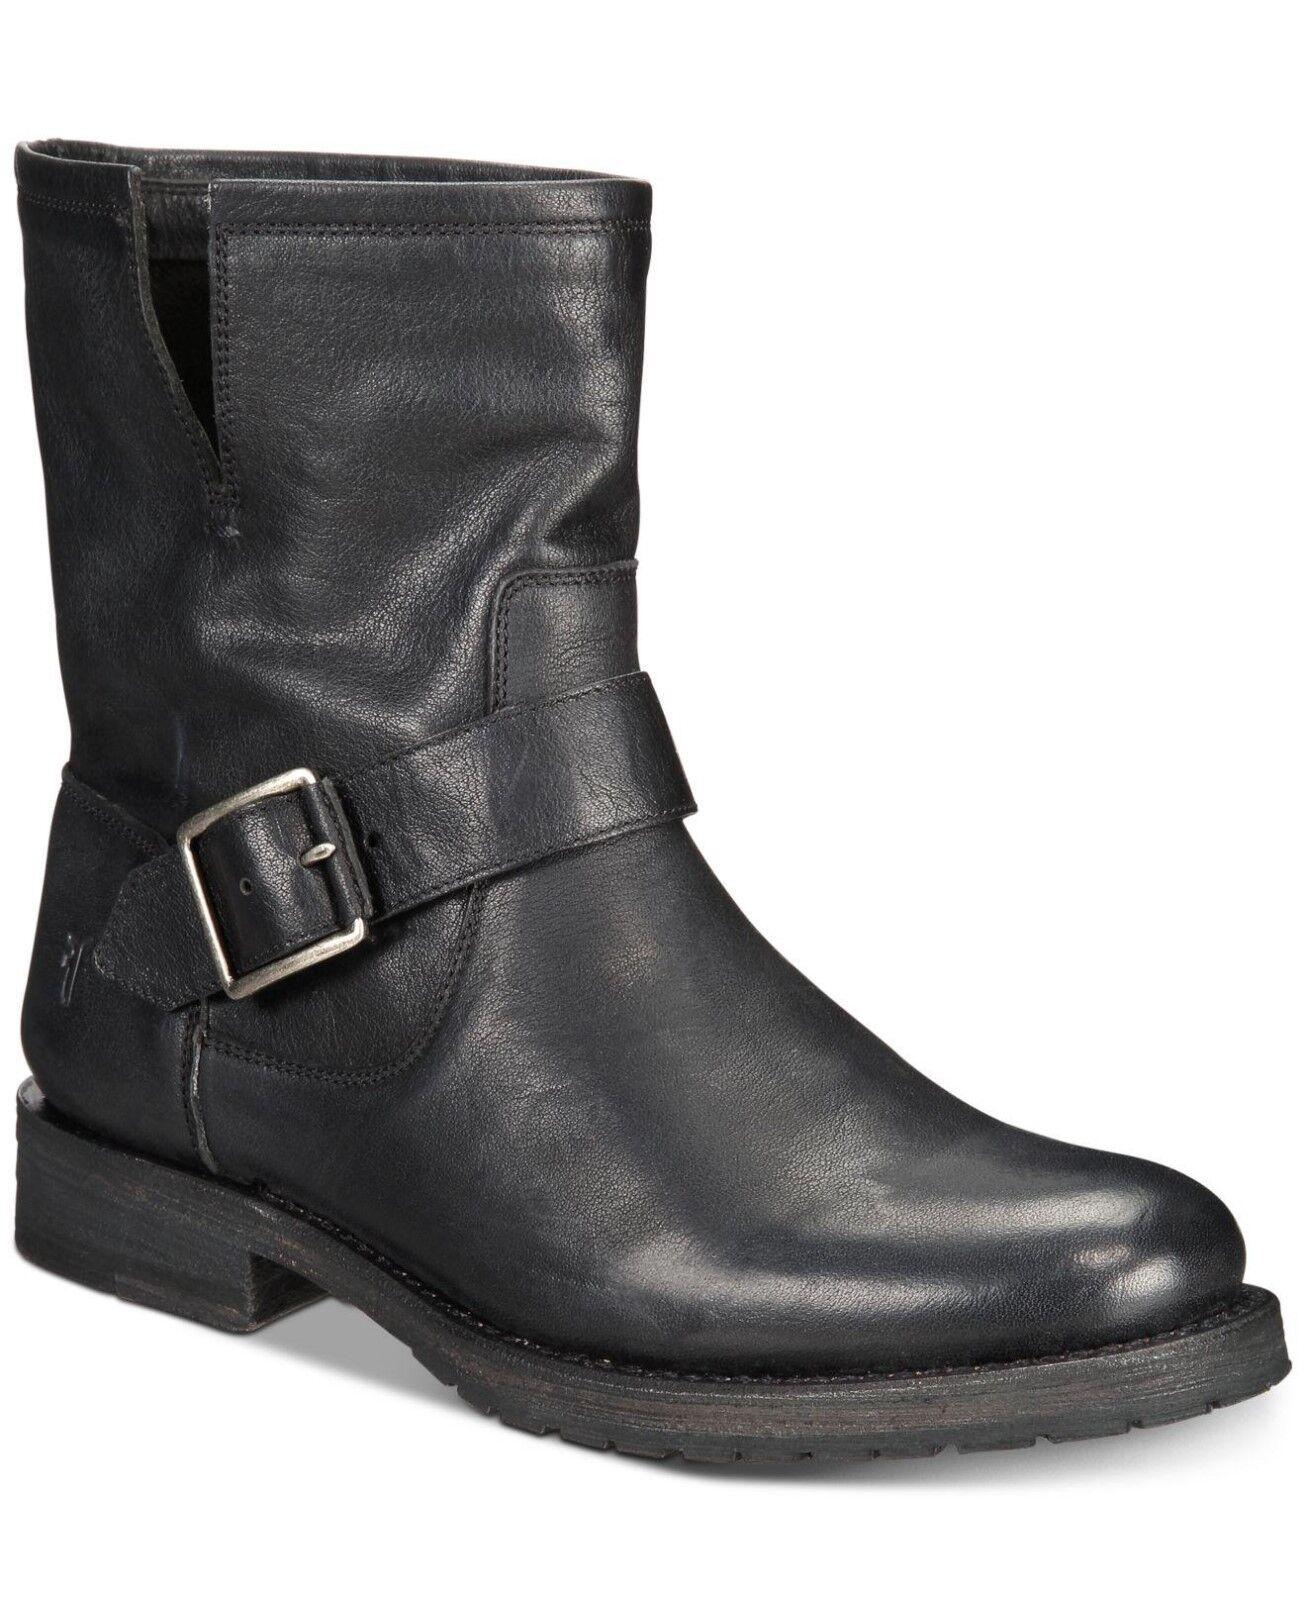 NEW w o Box Frye Natalie Leather Booties in Black Black Black - Size 9 001da8